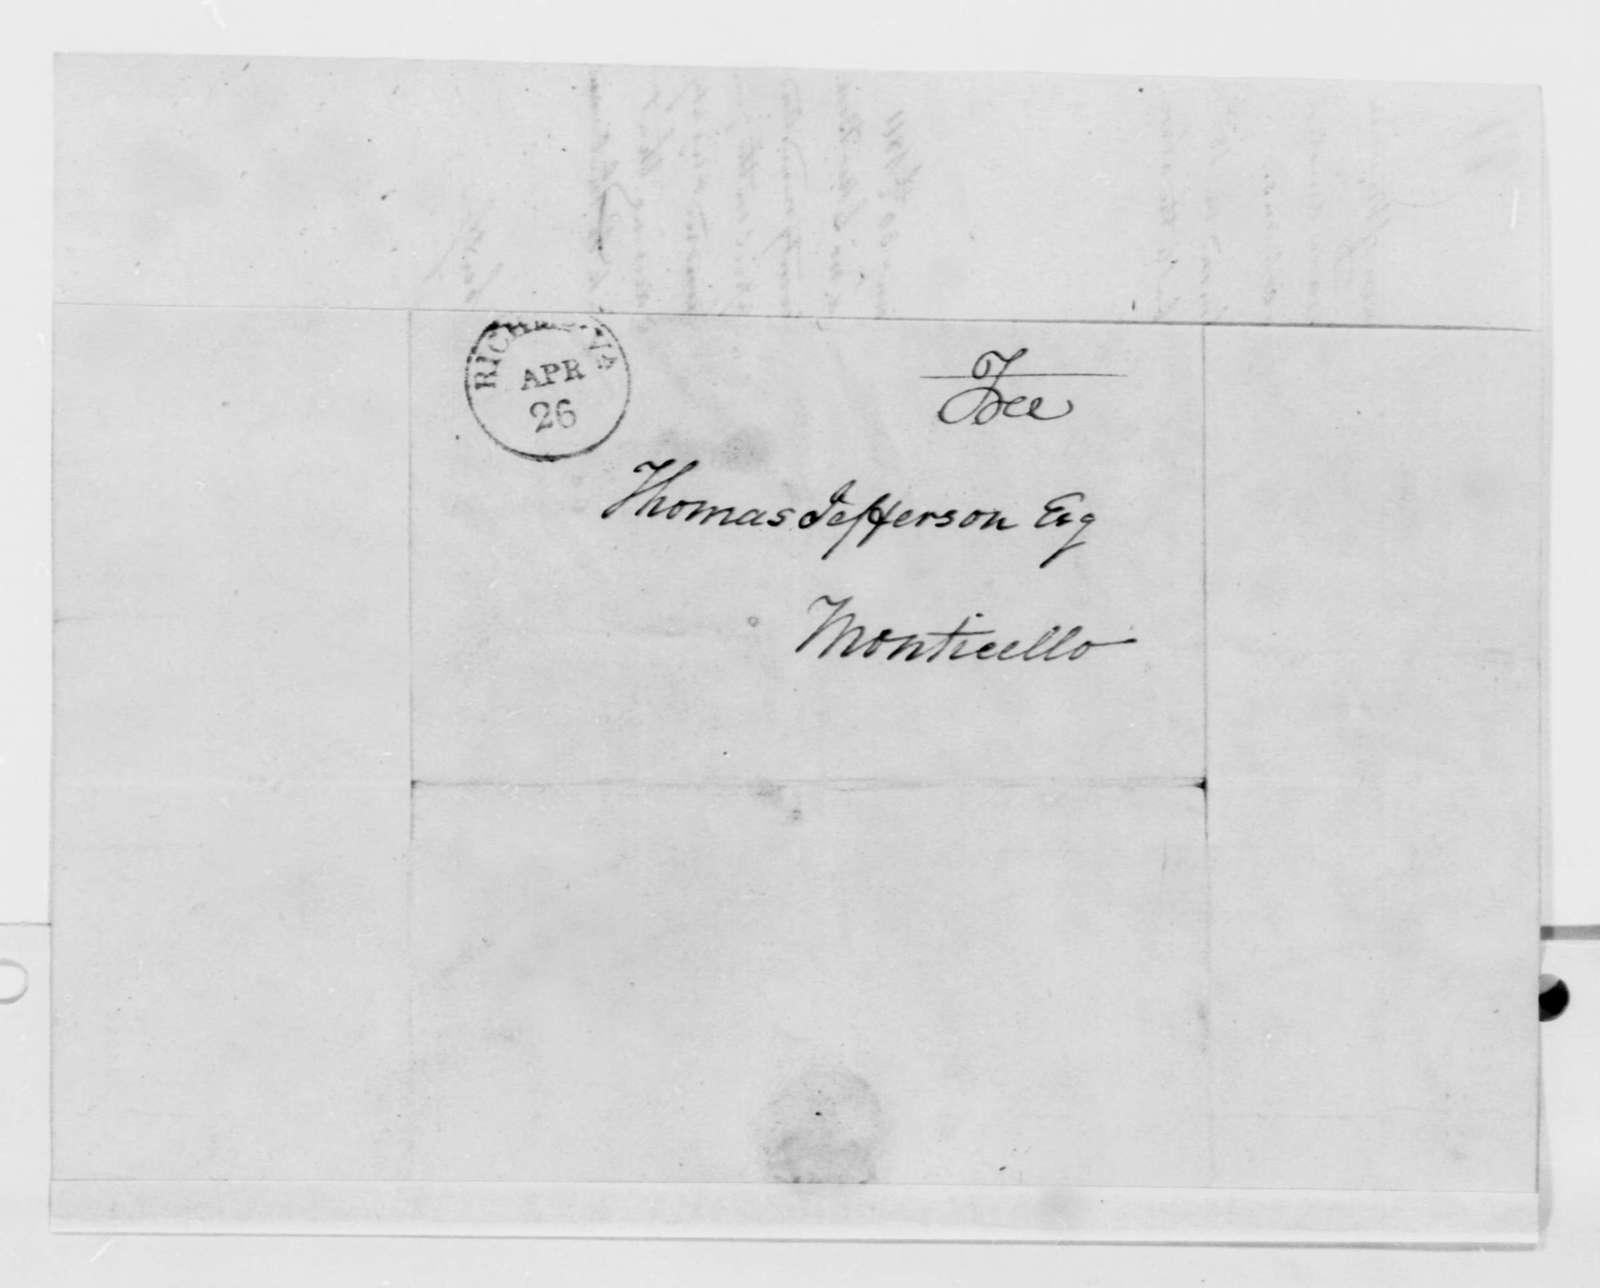 William Robertson to Thomas Jefferson, January 30, 1811